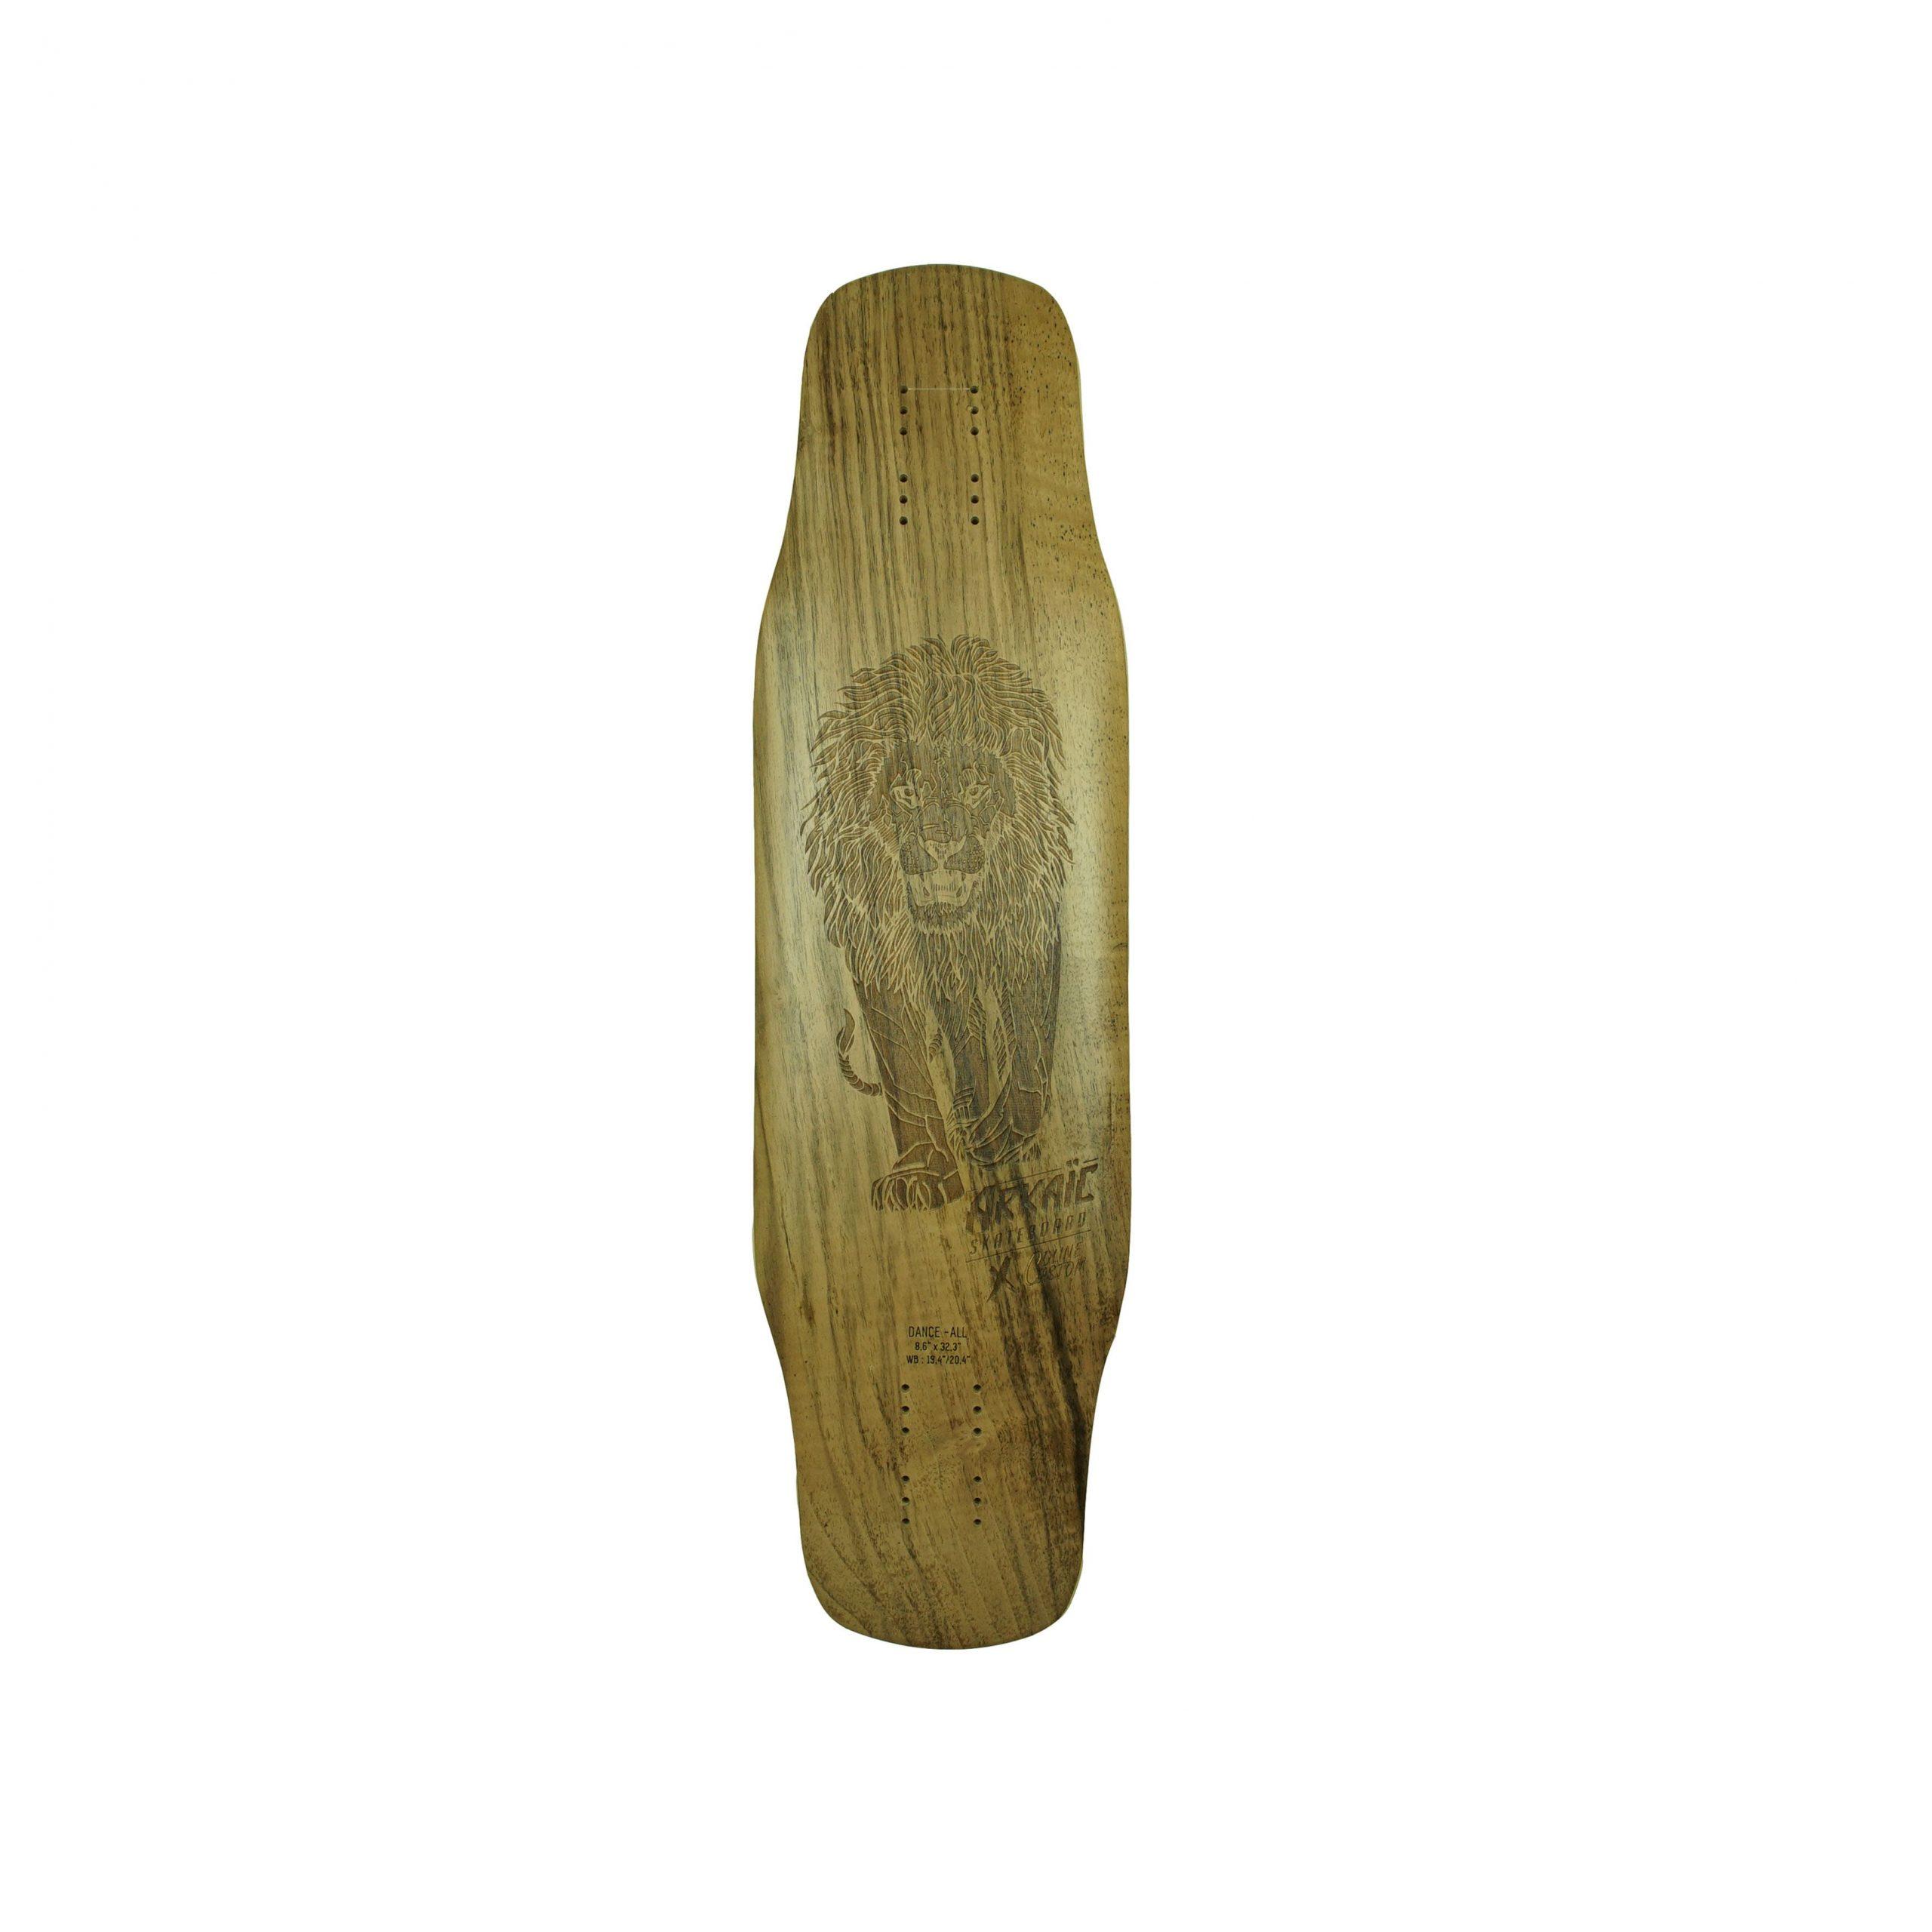 Longboard made in france 2018